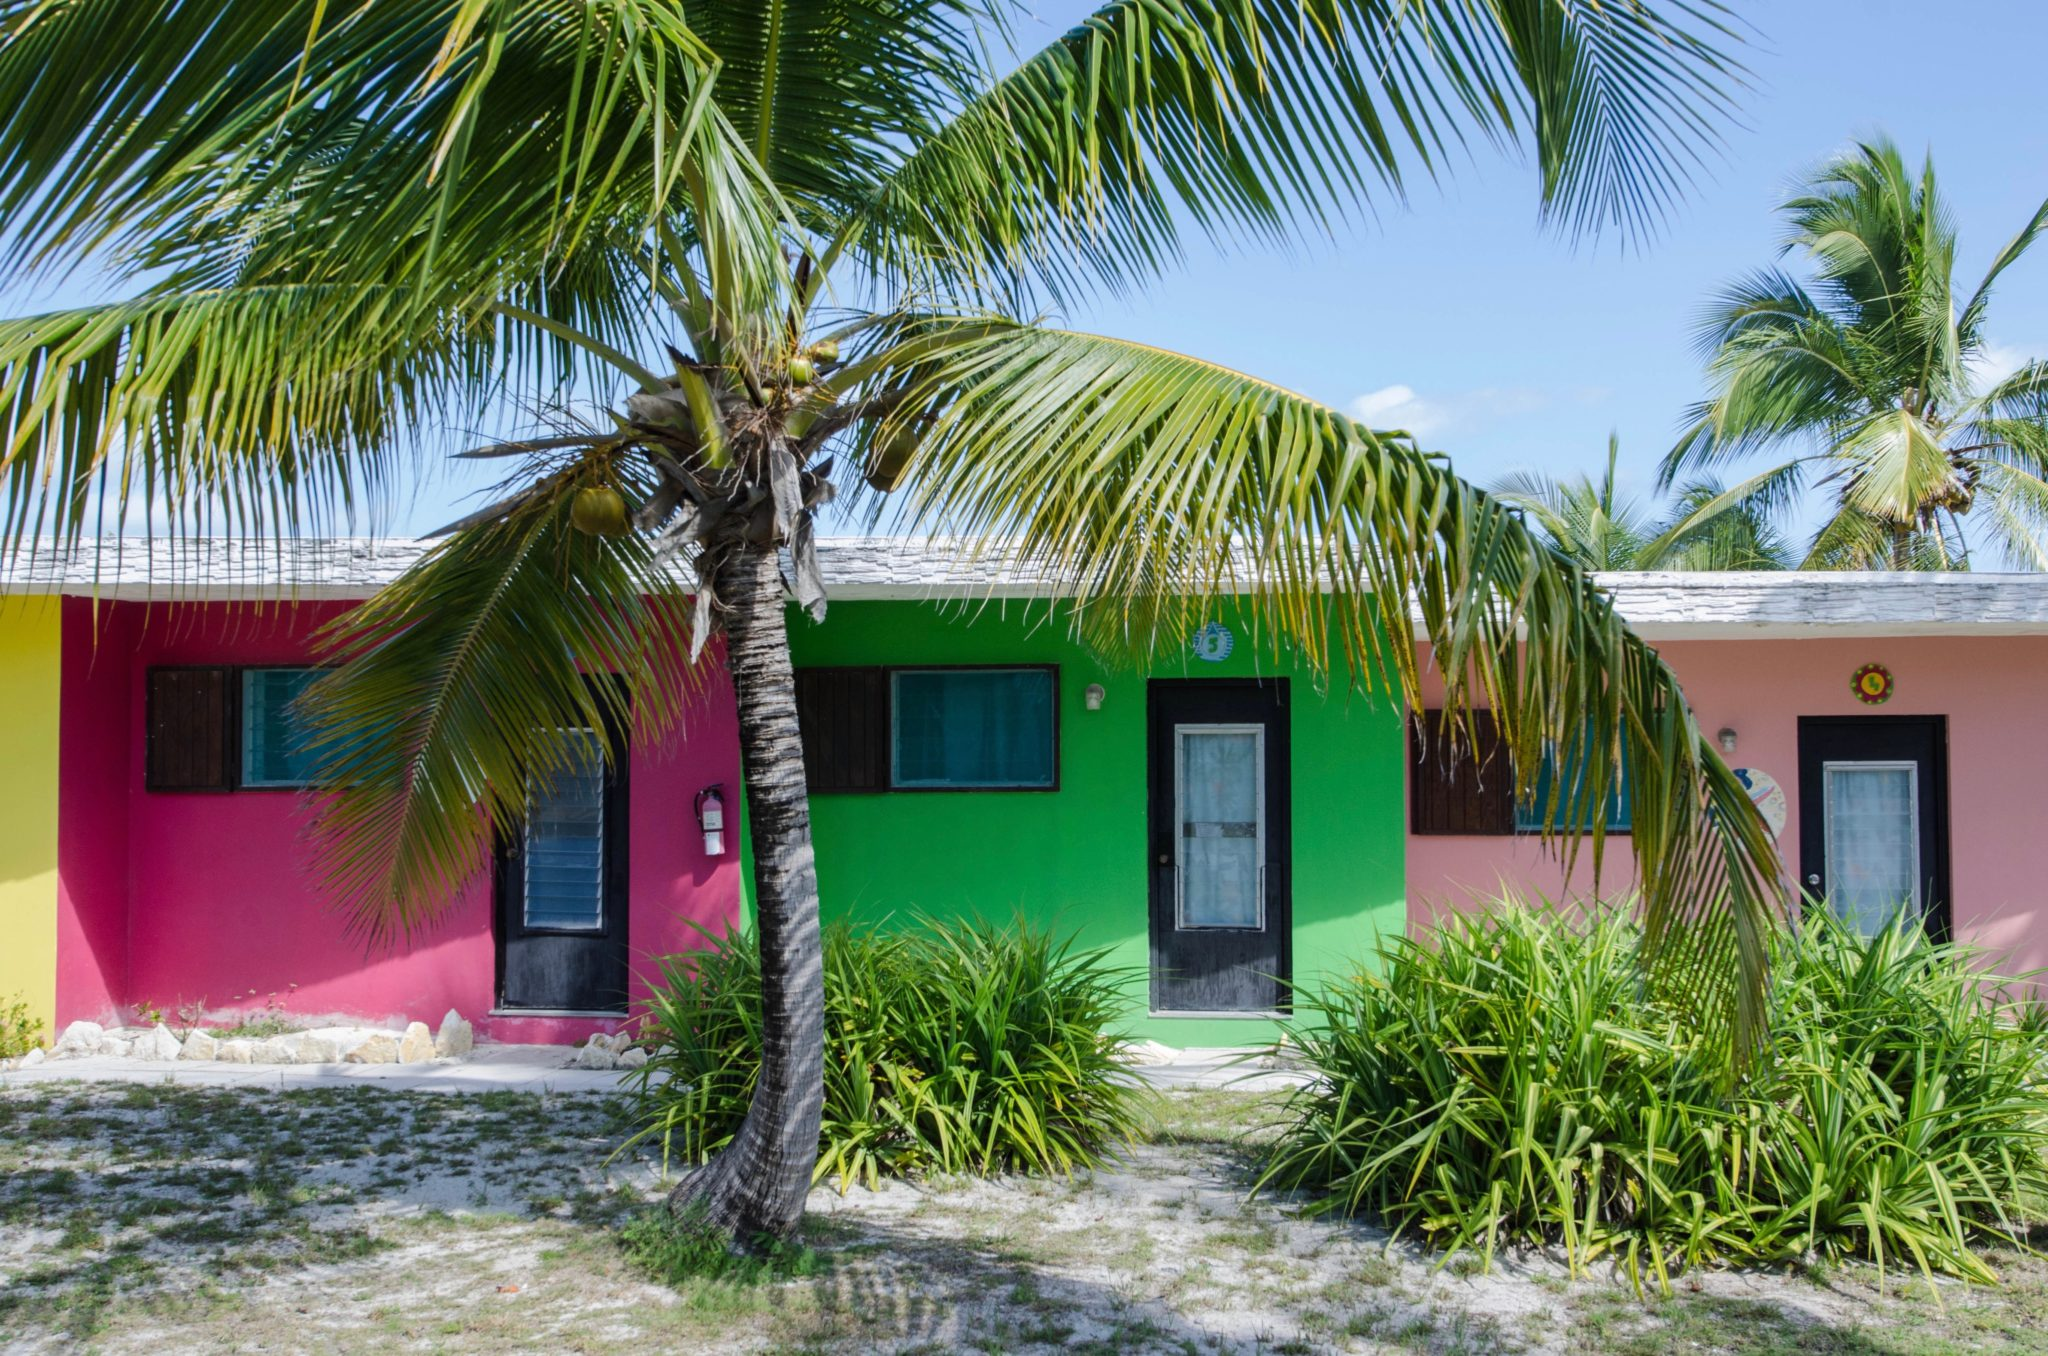 Greenwood Beach Resort: Hotel Bahamas Tipp